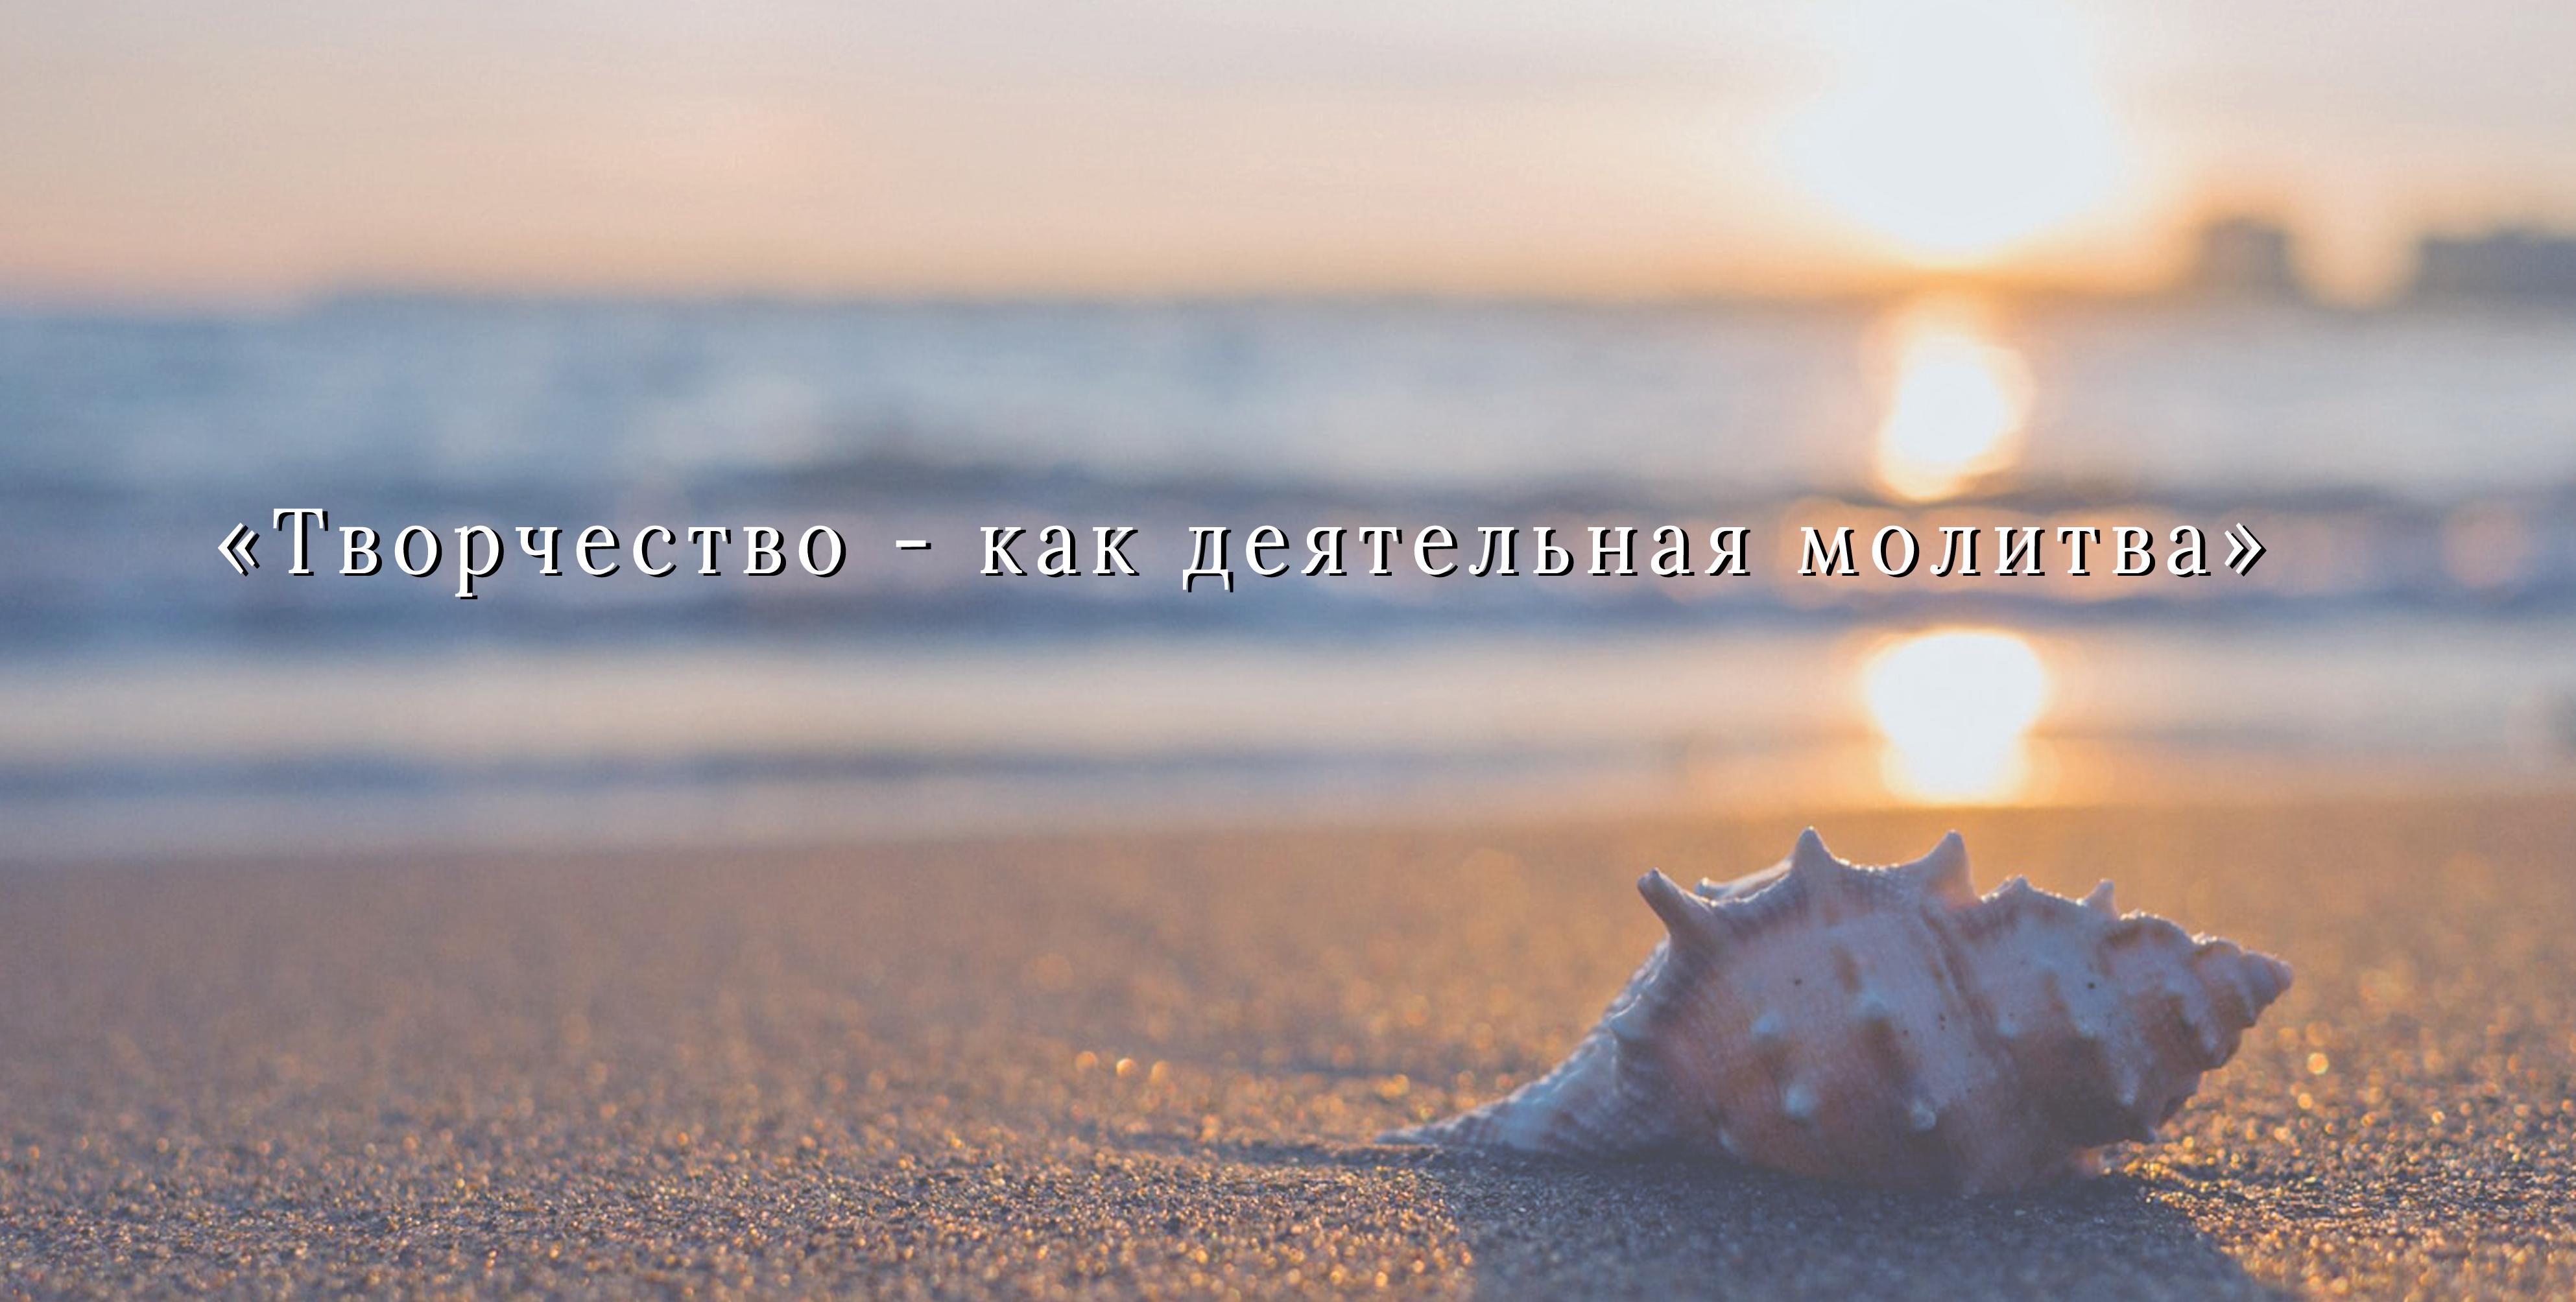 Выпуск 10. О влиянии снов, фантазий и внутреннего монолога на творчество